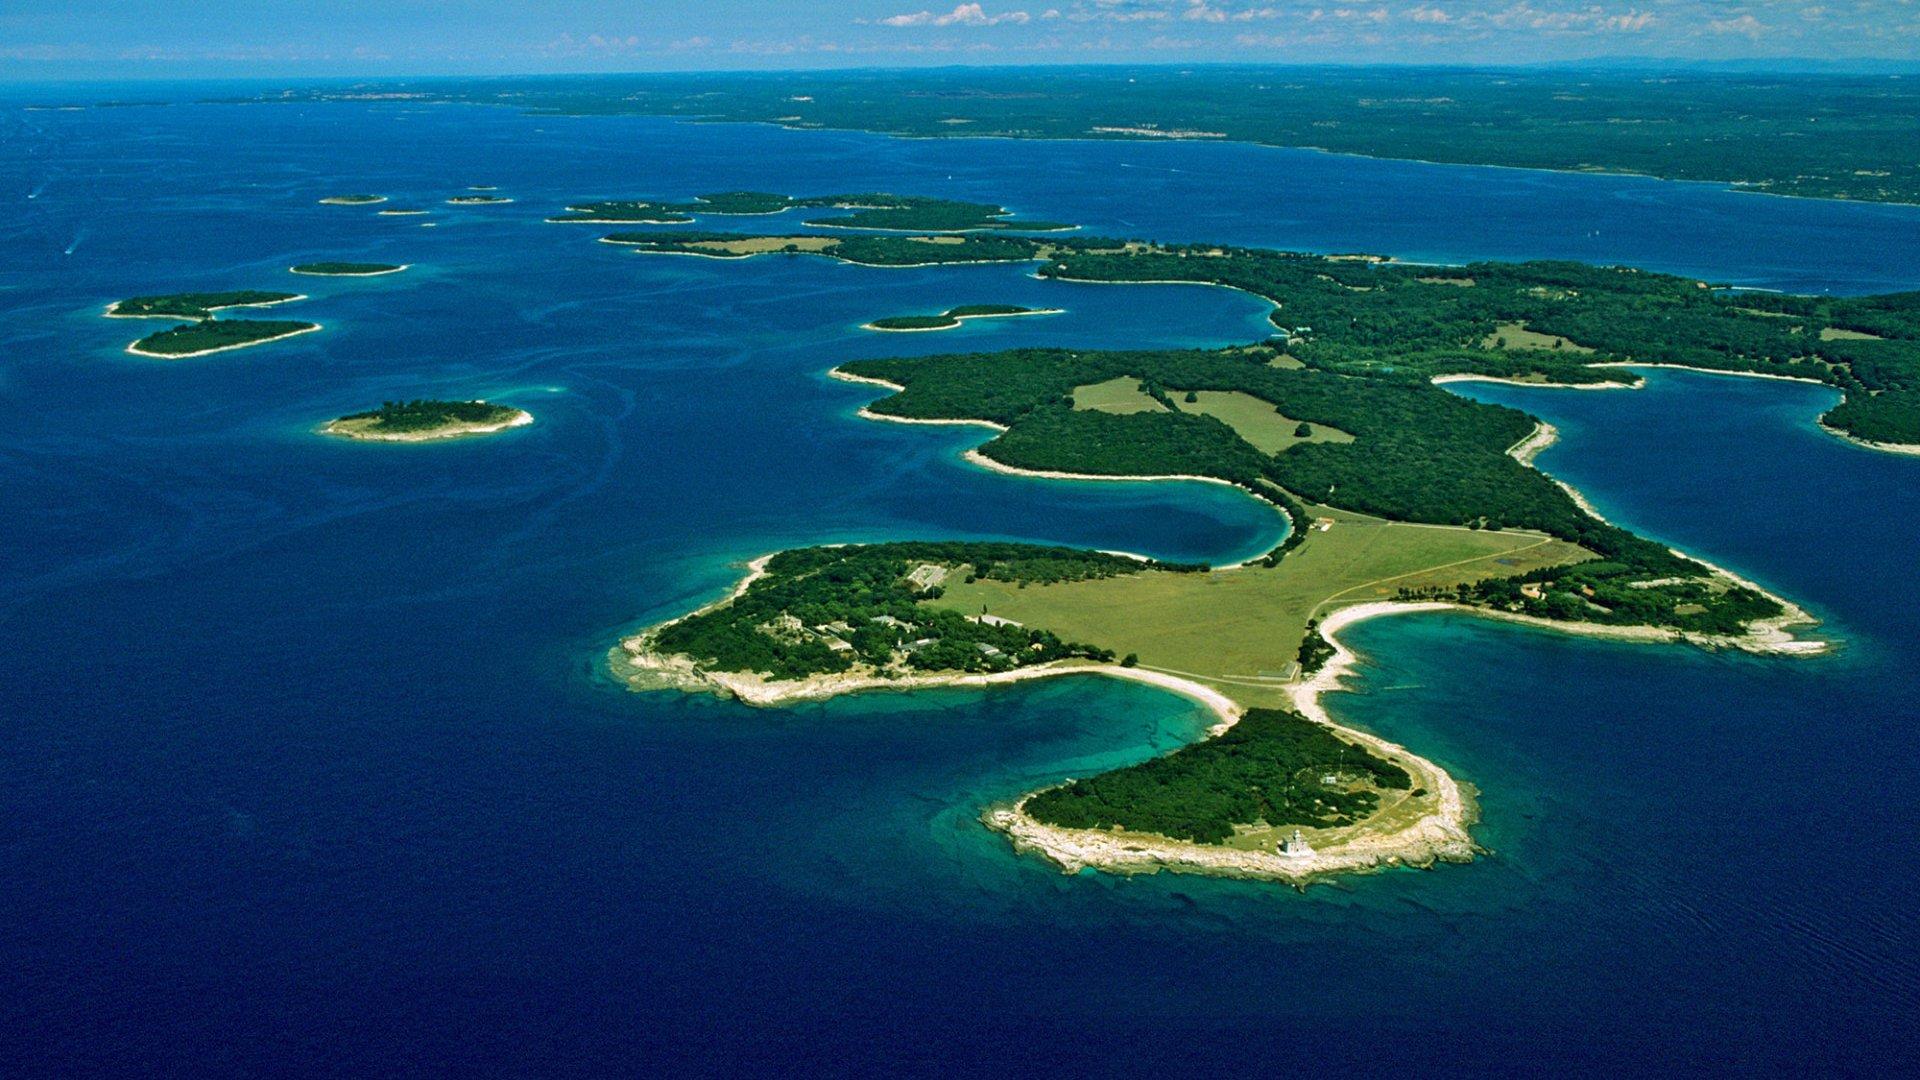 BRIJUNI ISLANDS NATIONAL PARK (by speed boat)